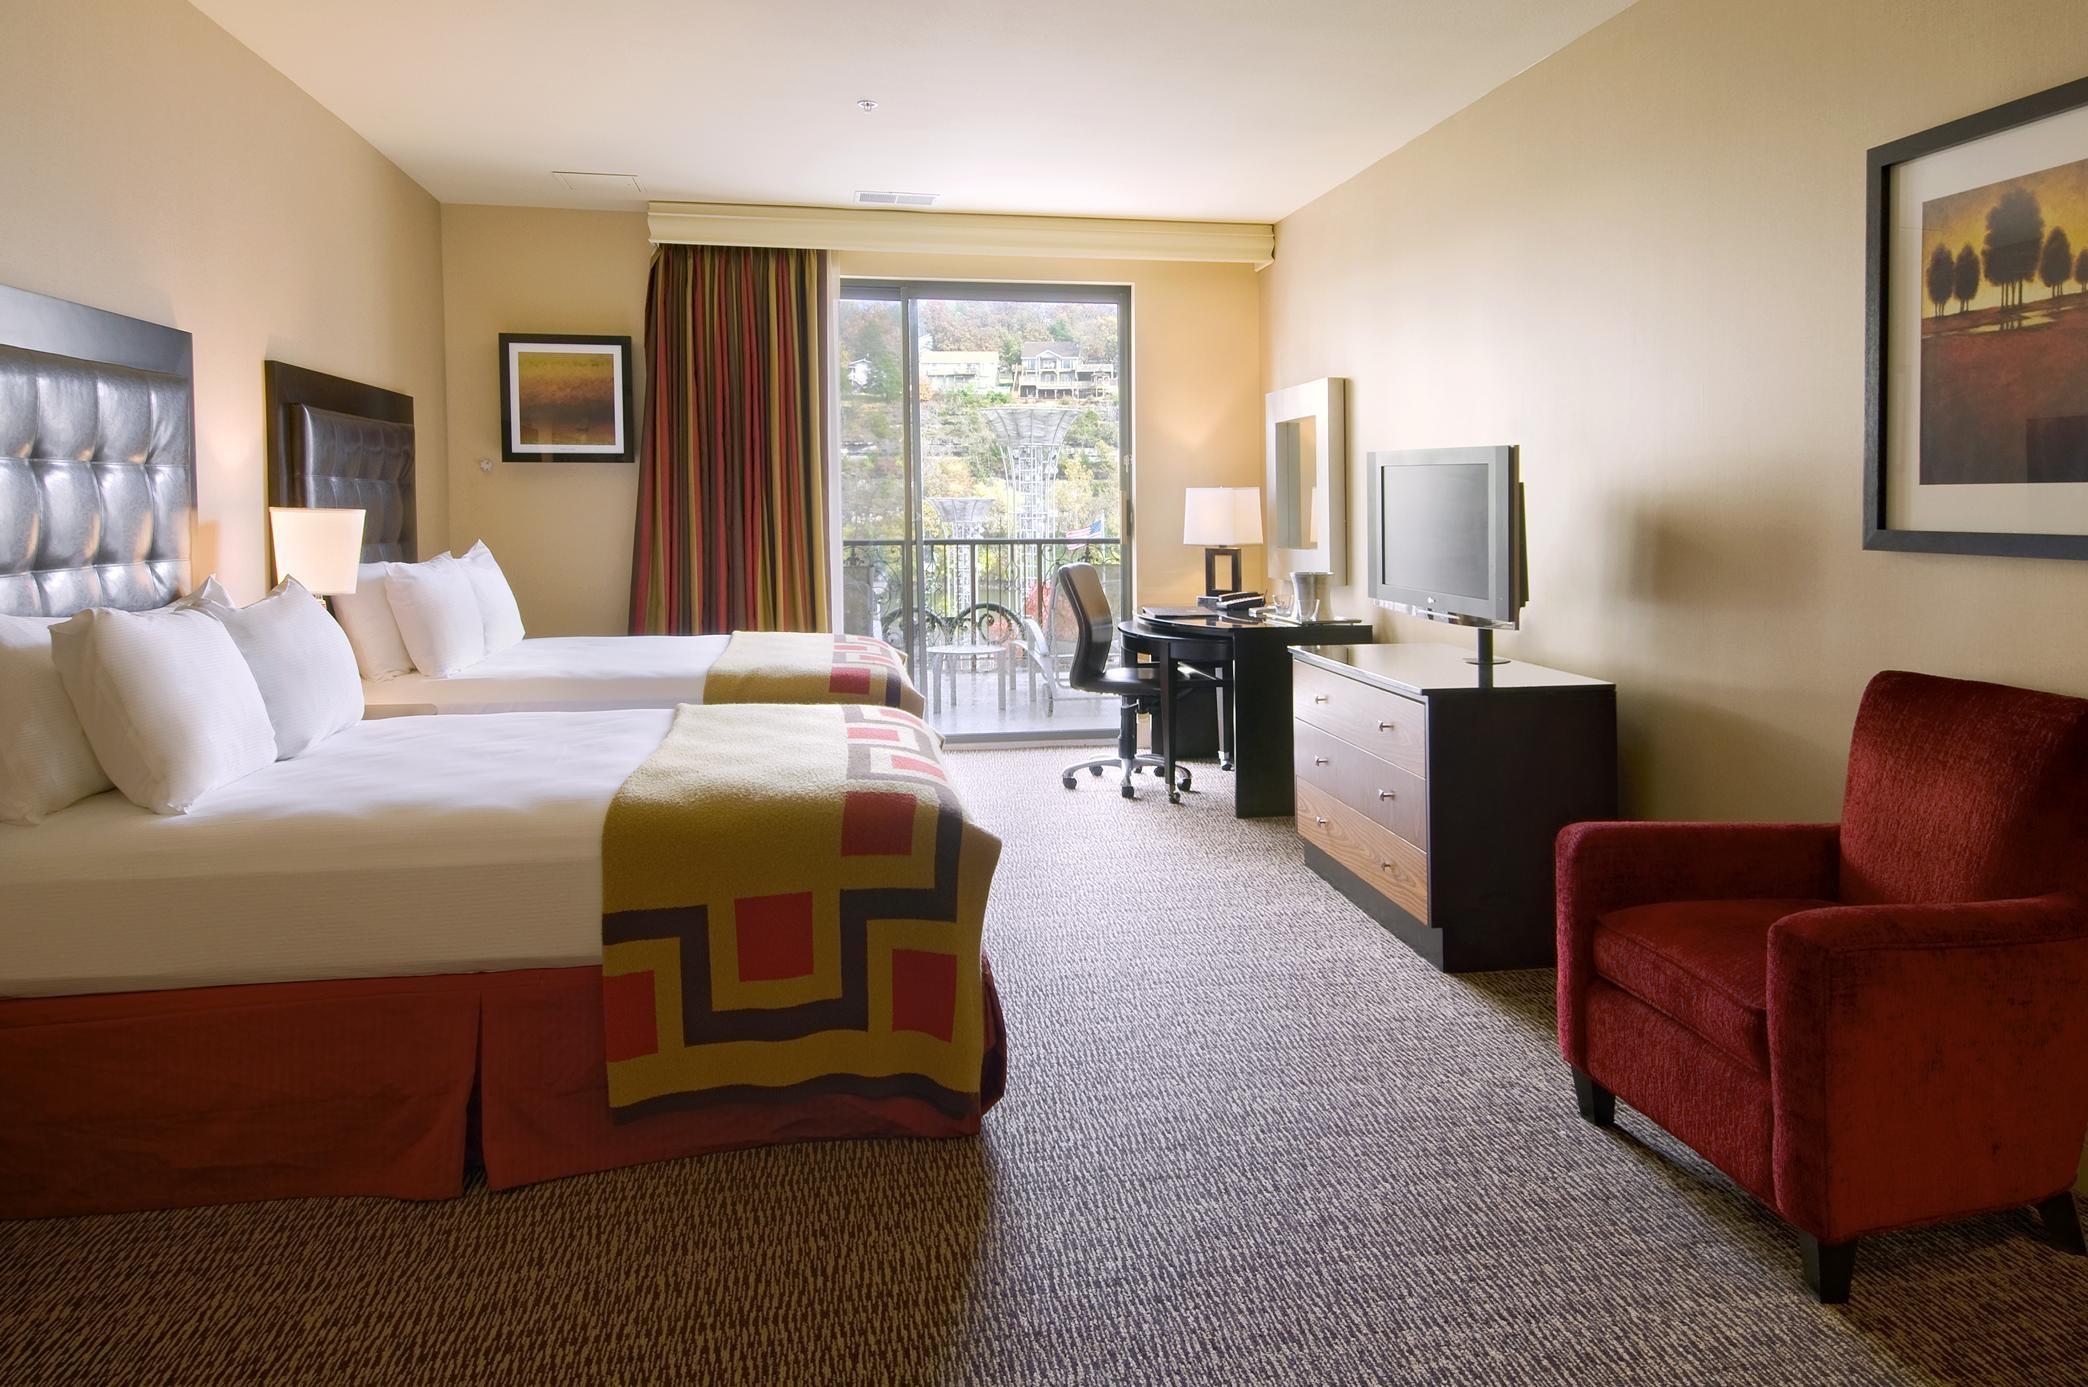 Hotels In Branson Mo Near The Landing